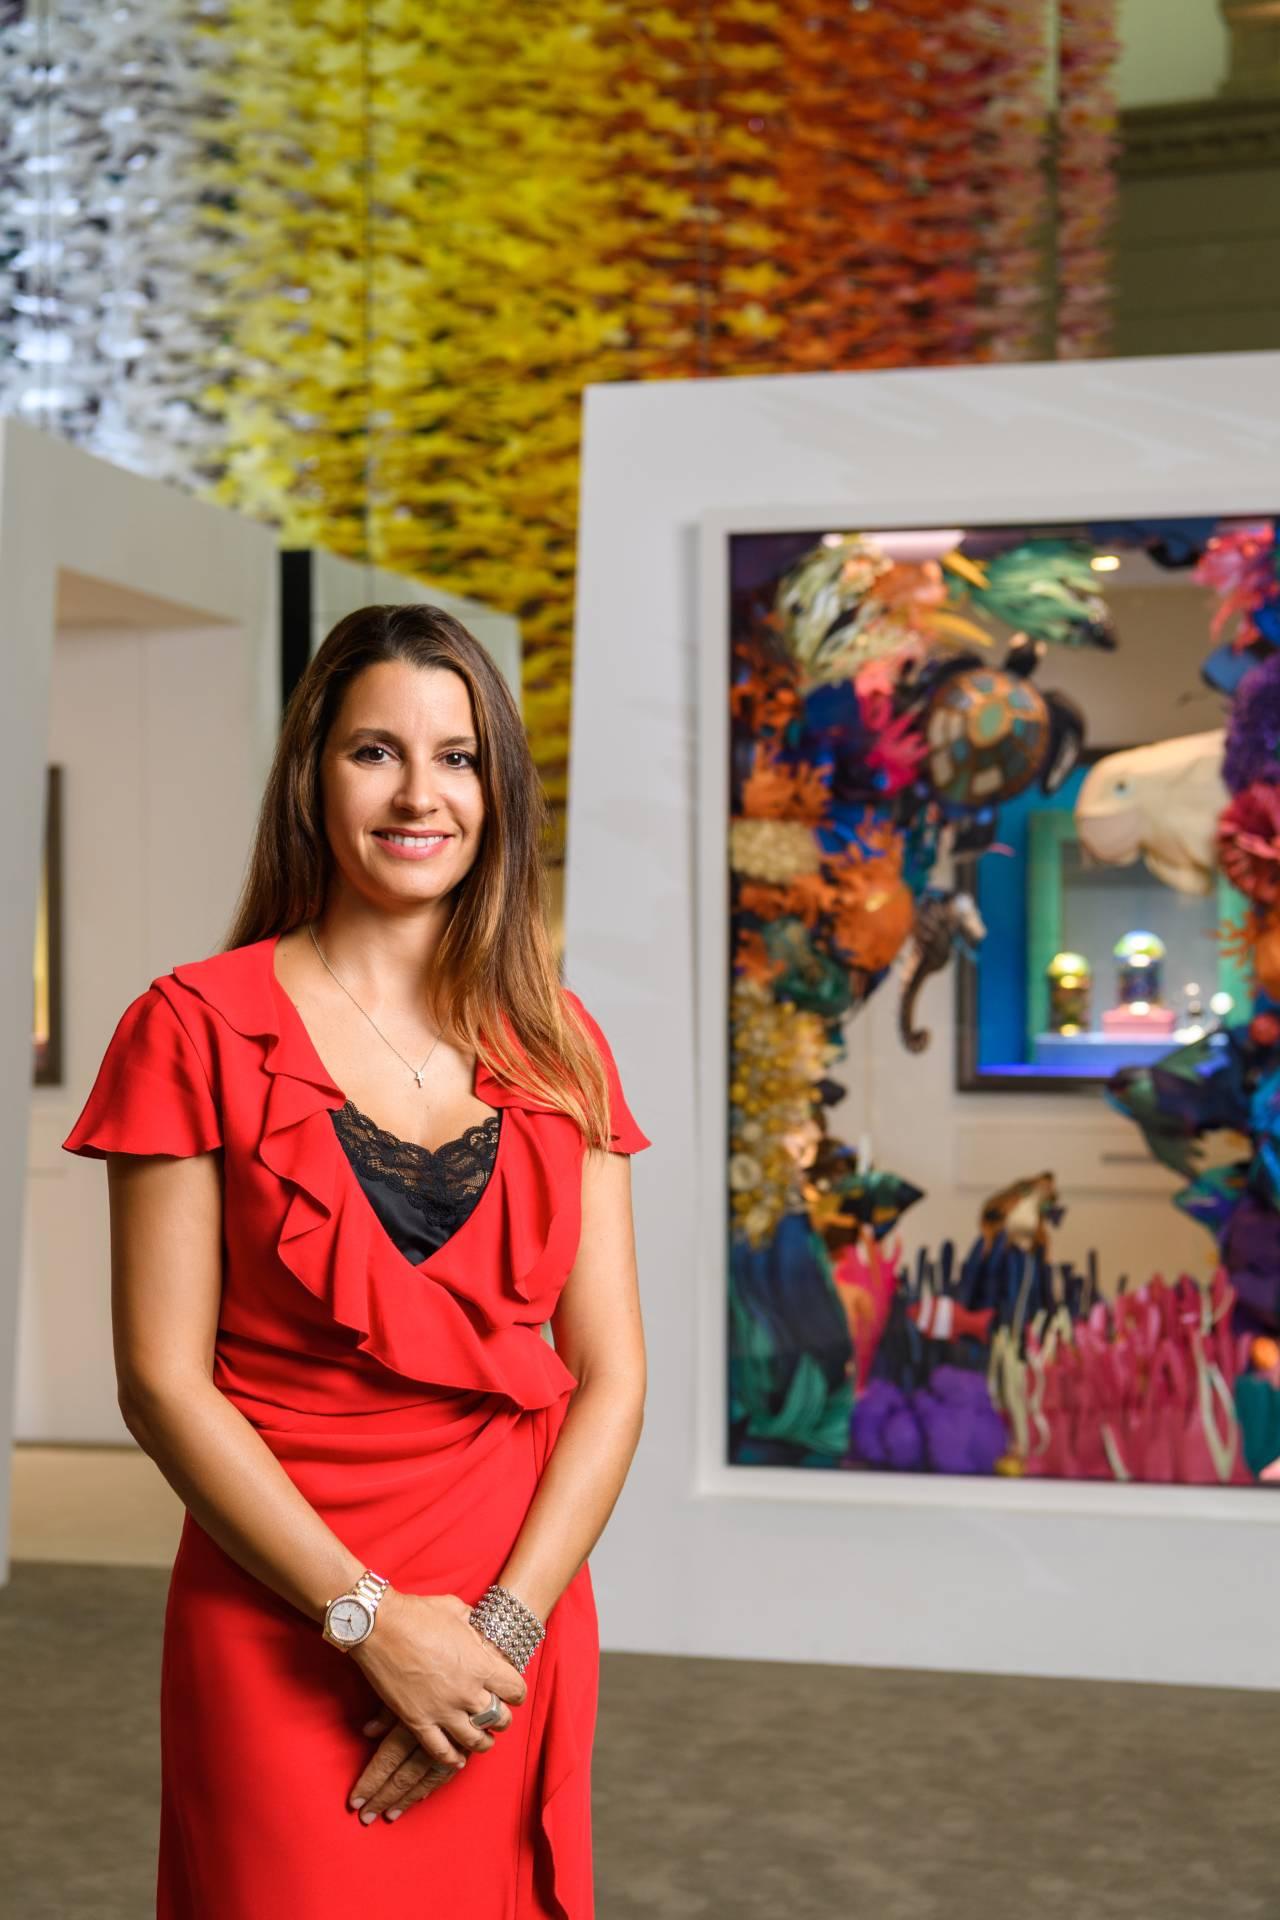 Sandrine Stern